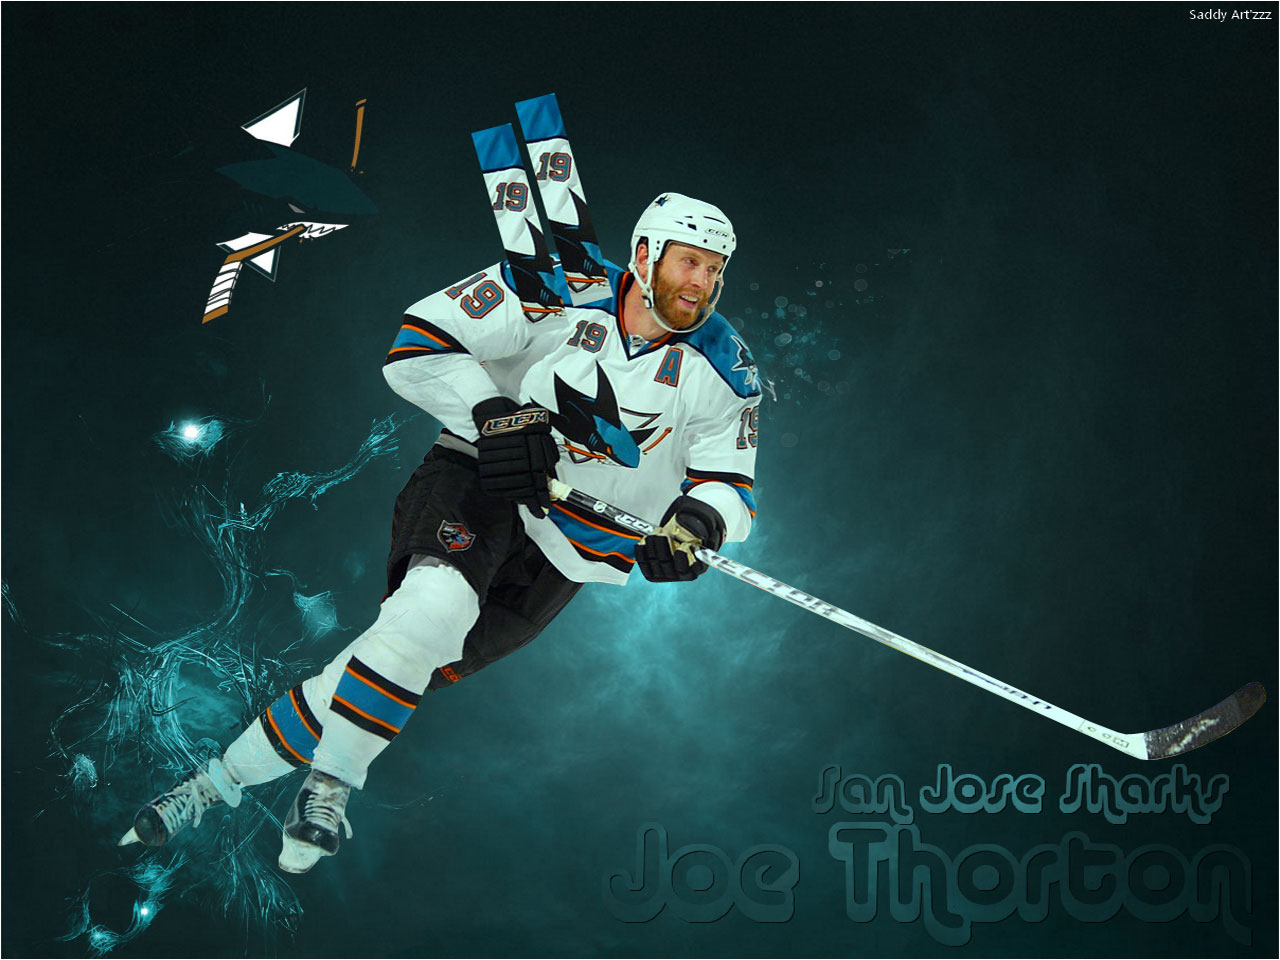 San Jose Sharks HD Wallpaper